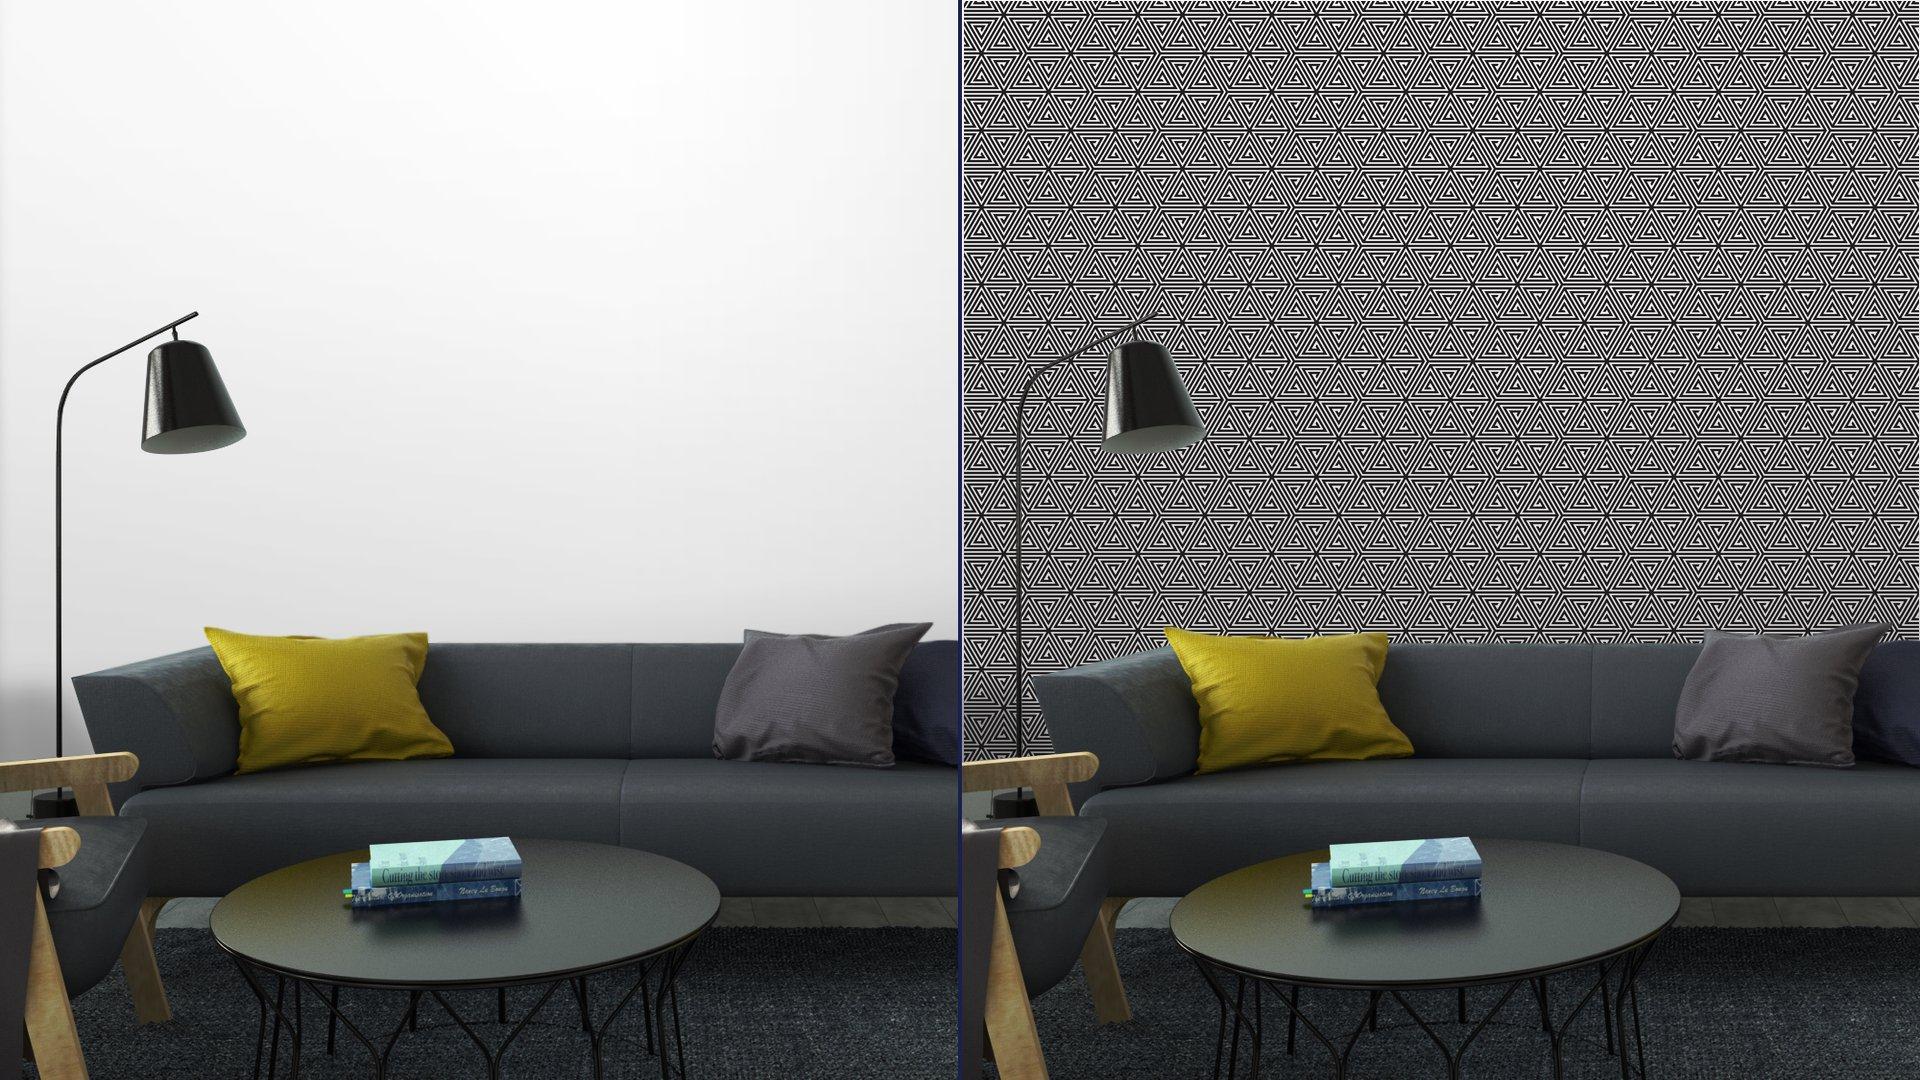 Fotomurales mexico papeles pintados triangulos blanco y negro modelo geometrico abstracto inconsutil 6 - Papel Tapiz Patrón Geométrico Triángulo 06